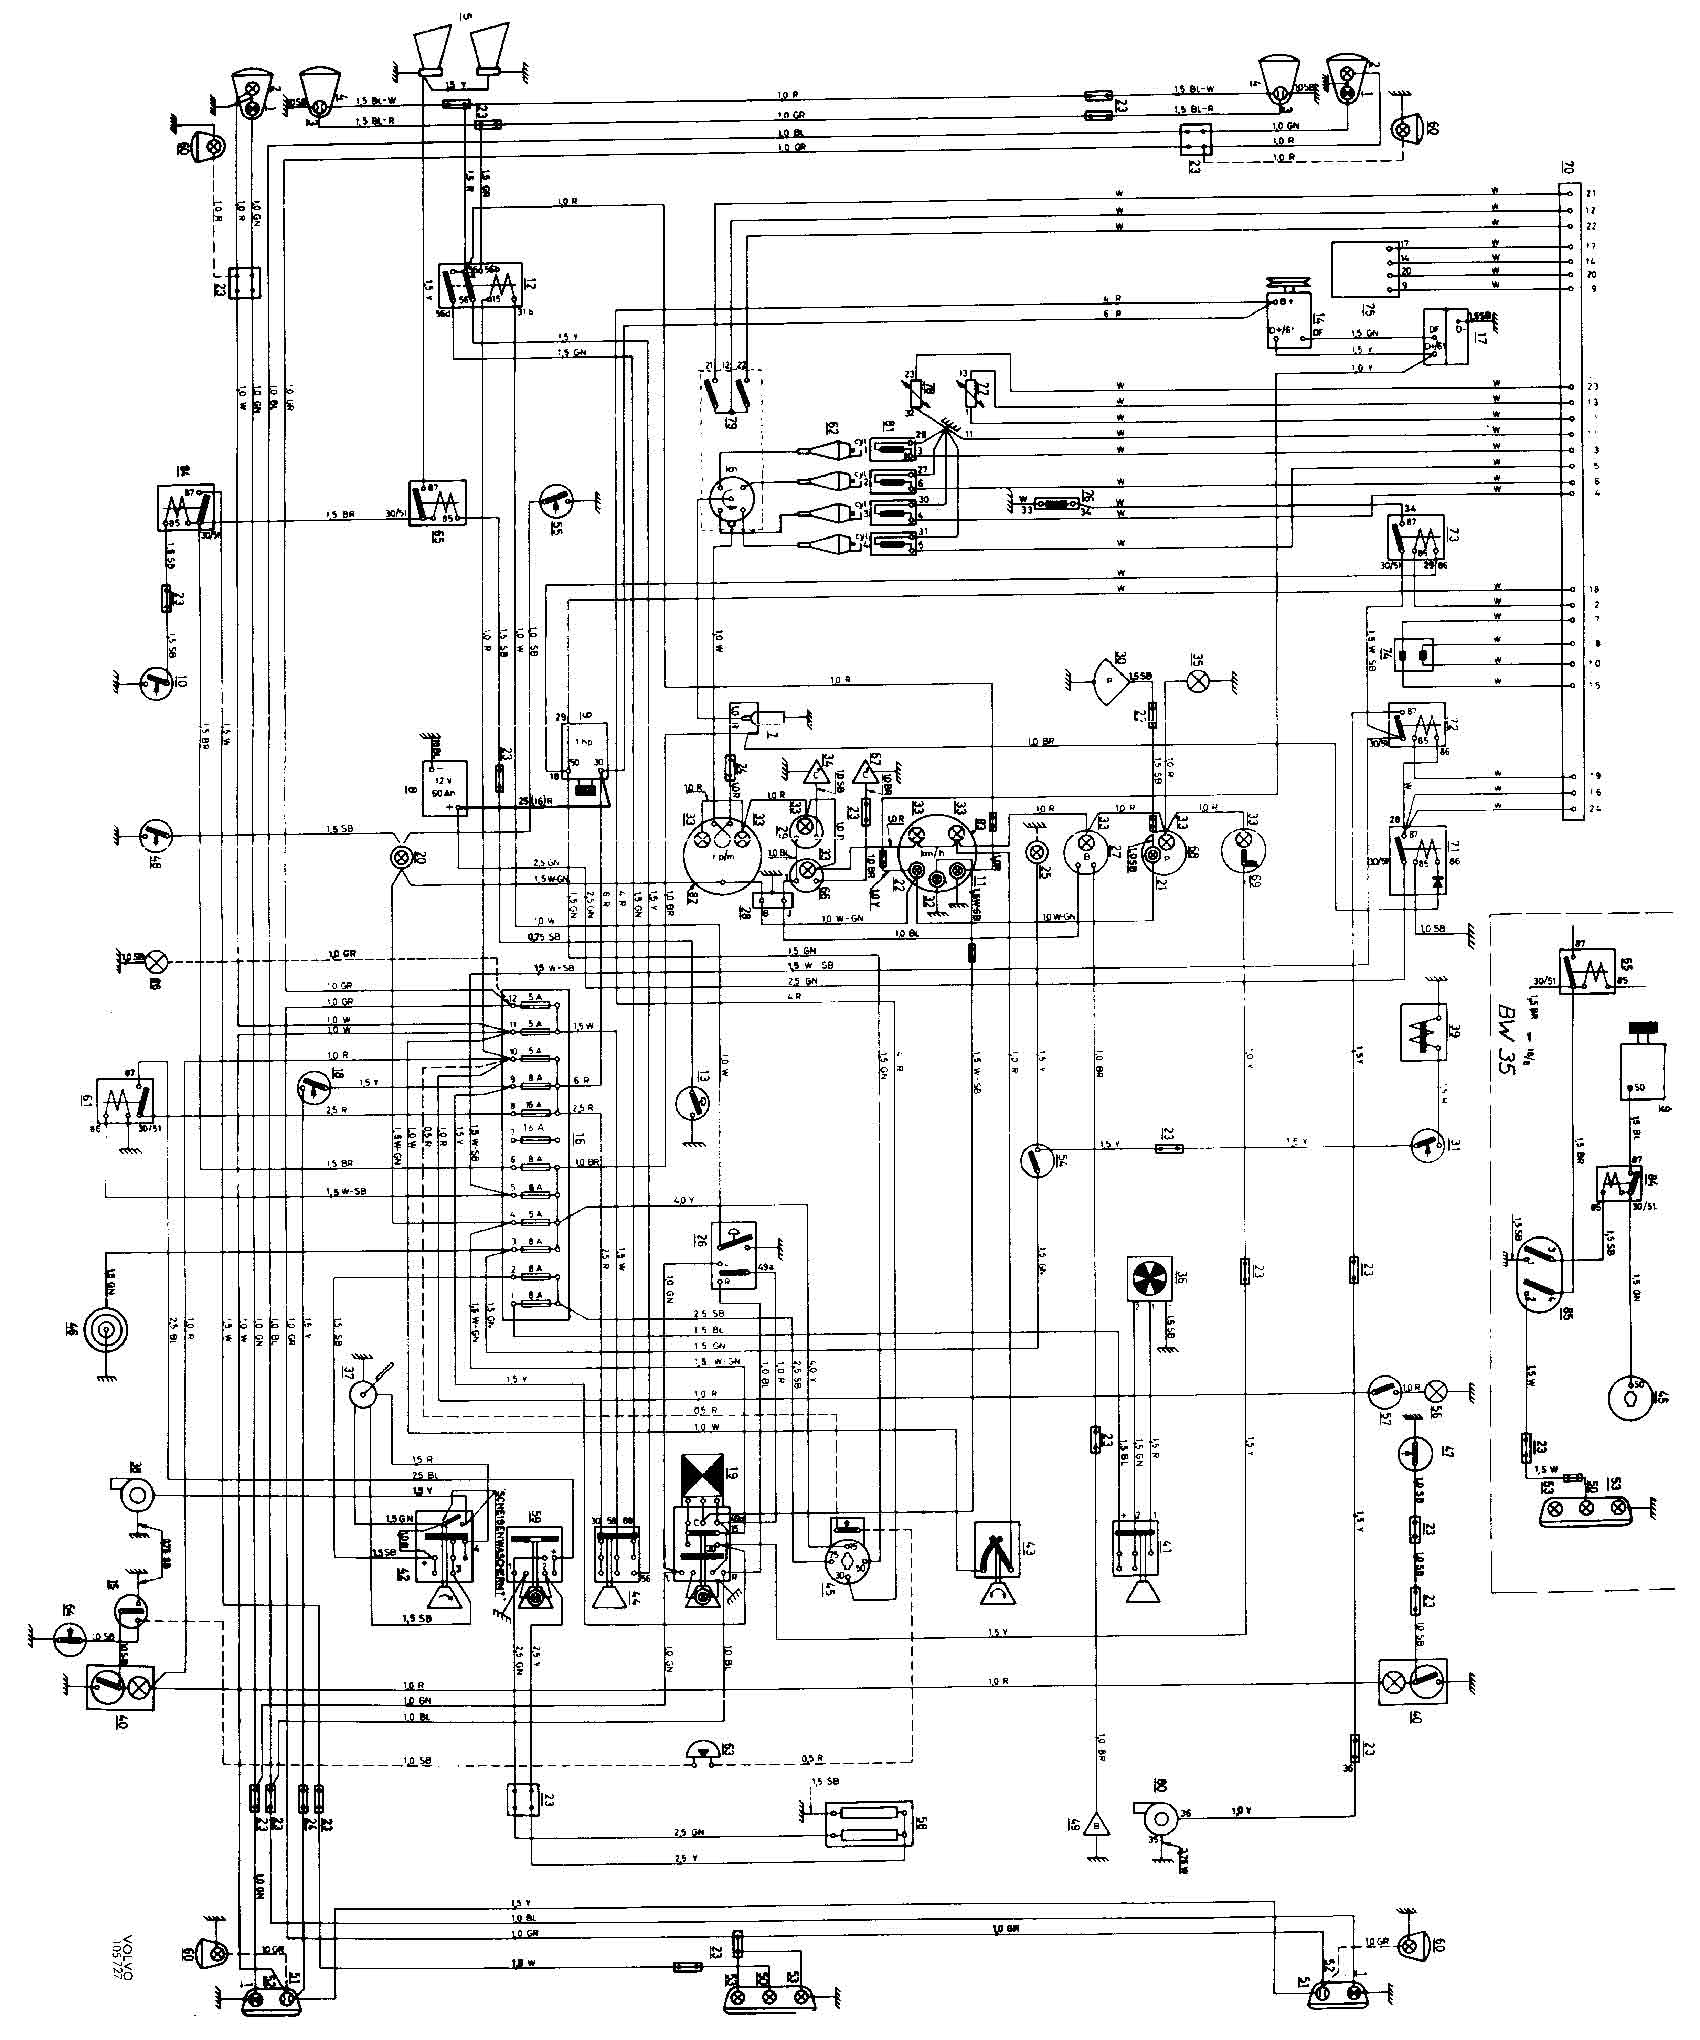 2006 volvo s40 radio wiring diagram